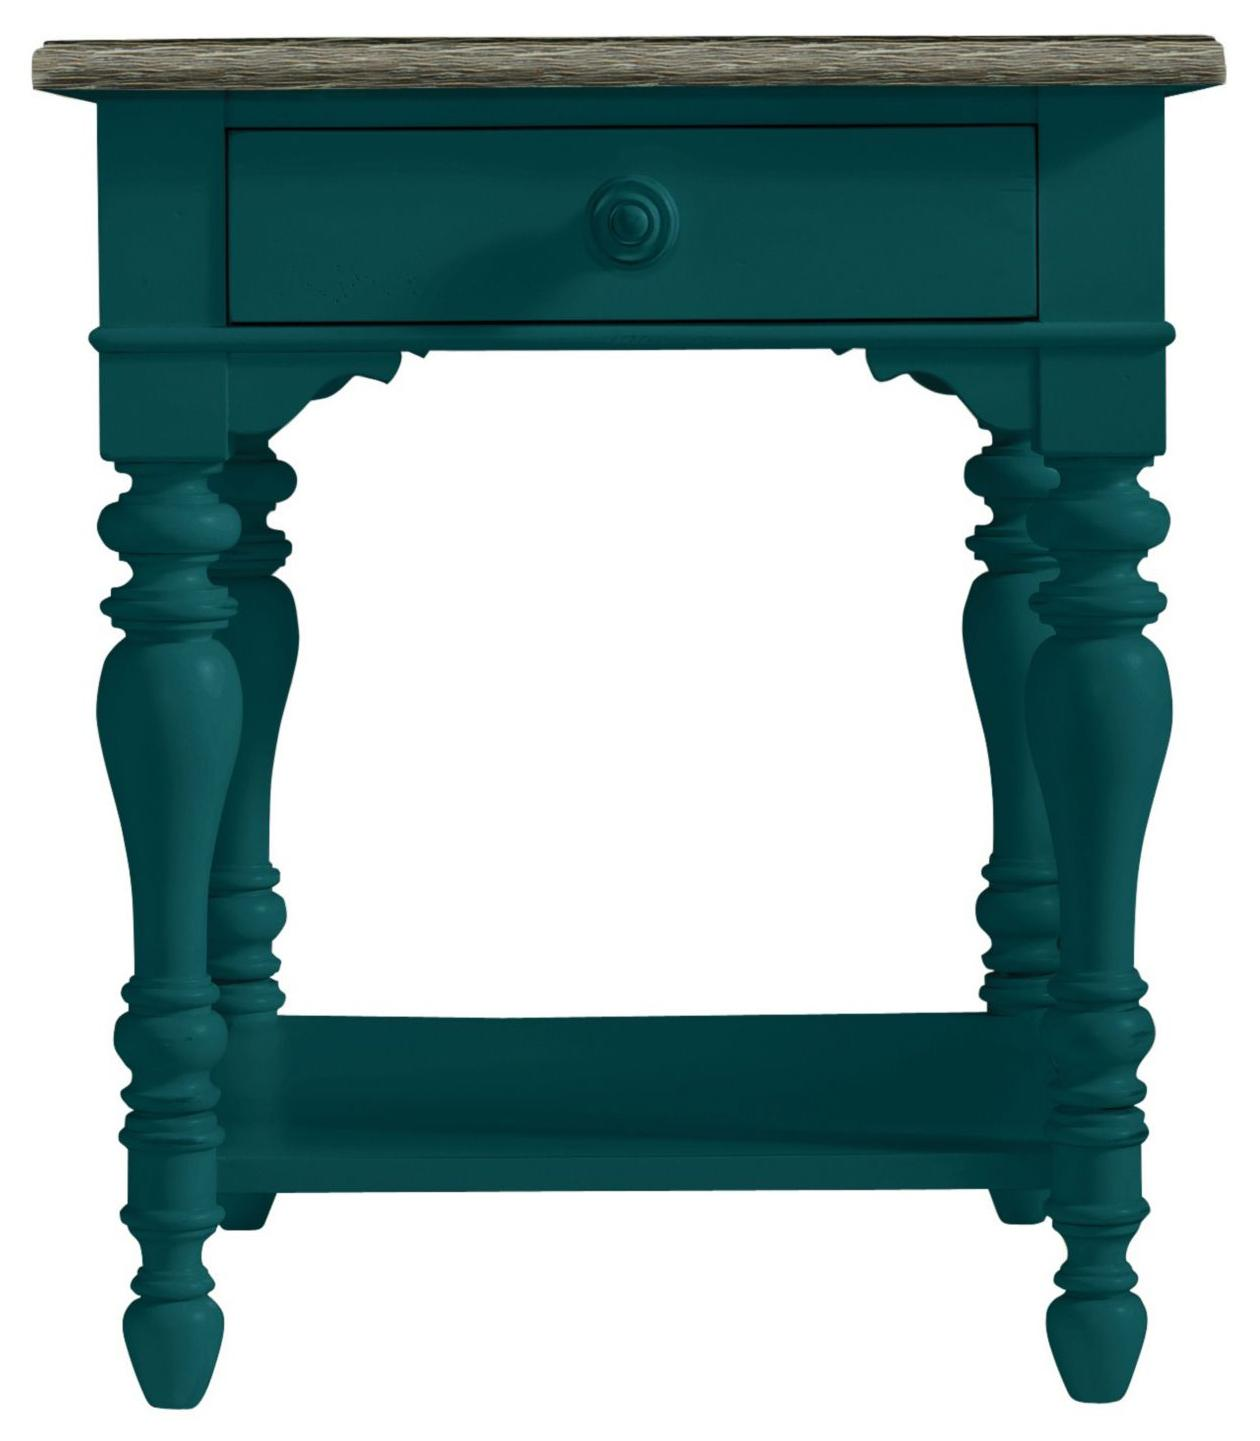 Stanley Furniture Coastal Living Retreat Lamp Table - Item Number: 411-45-09